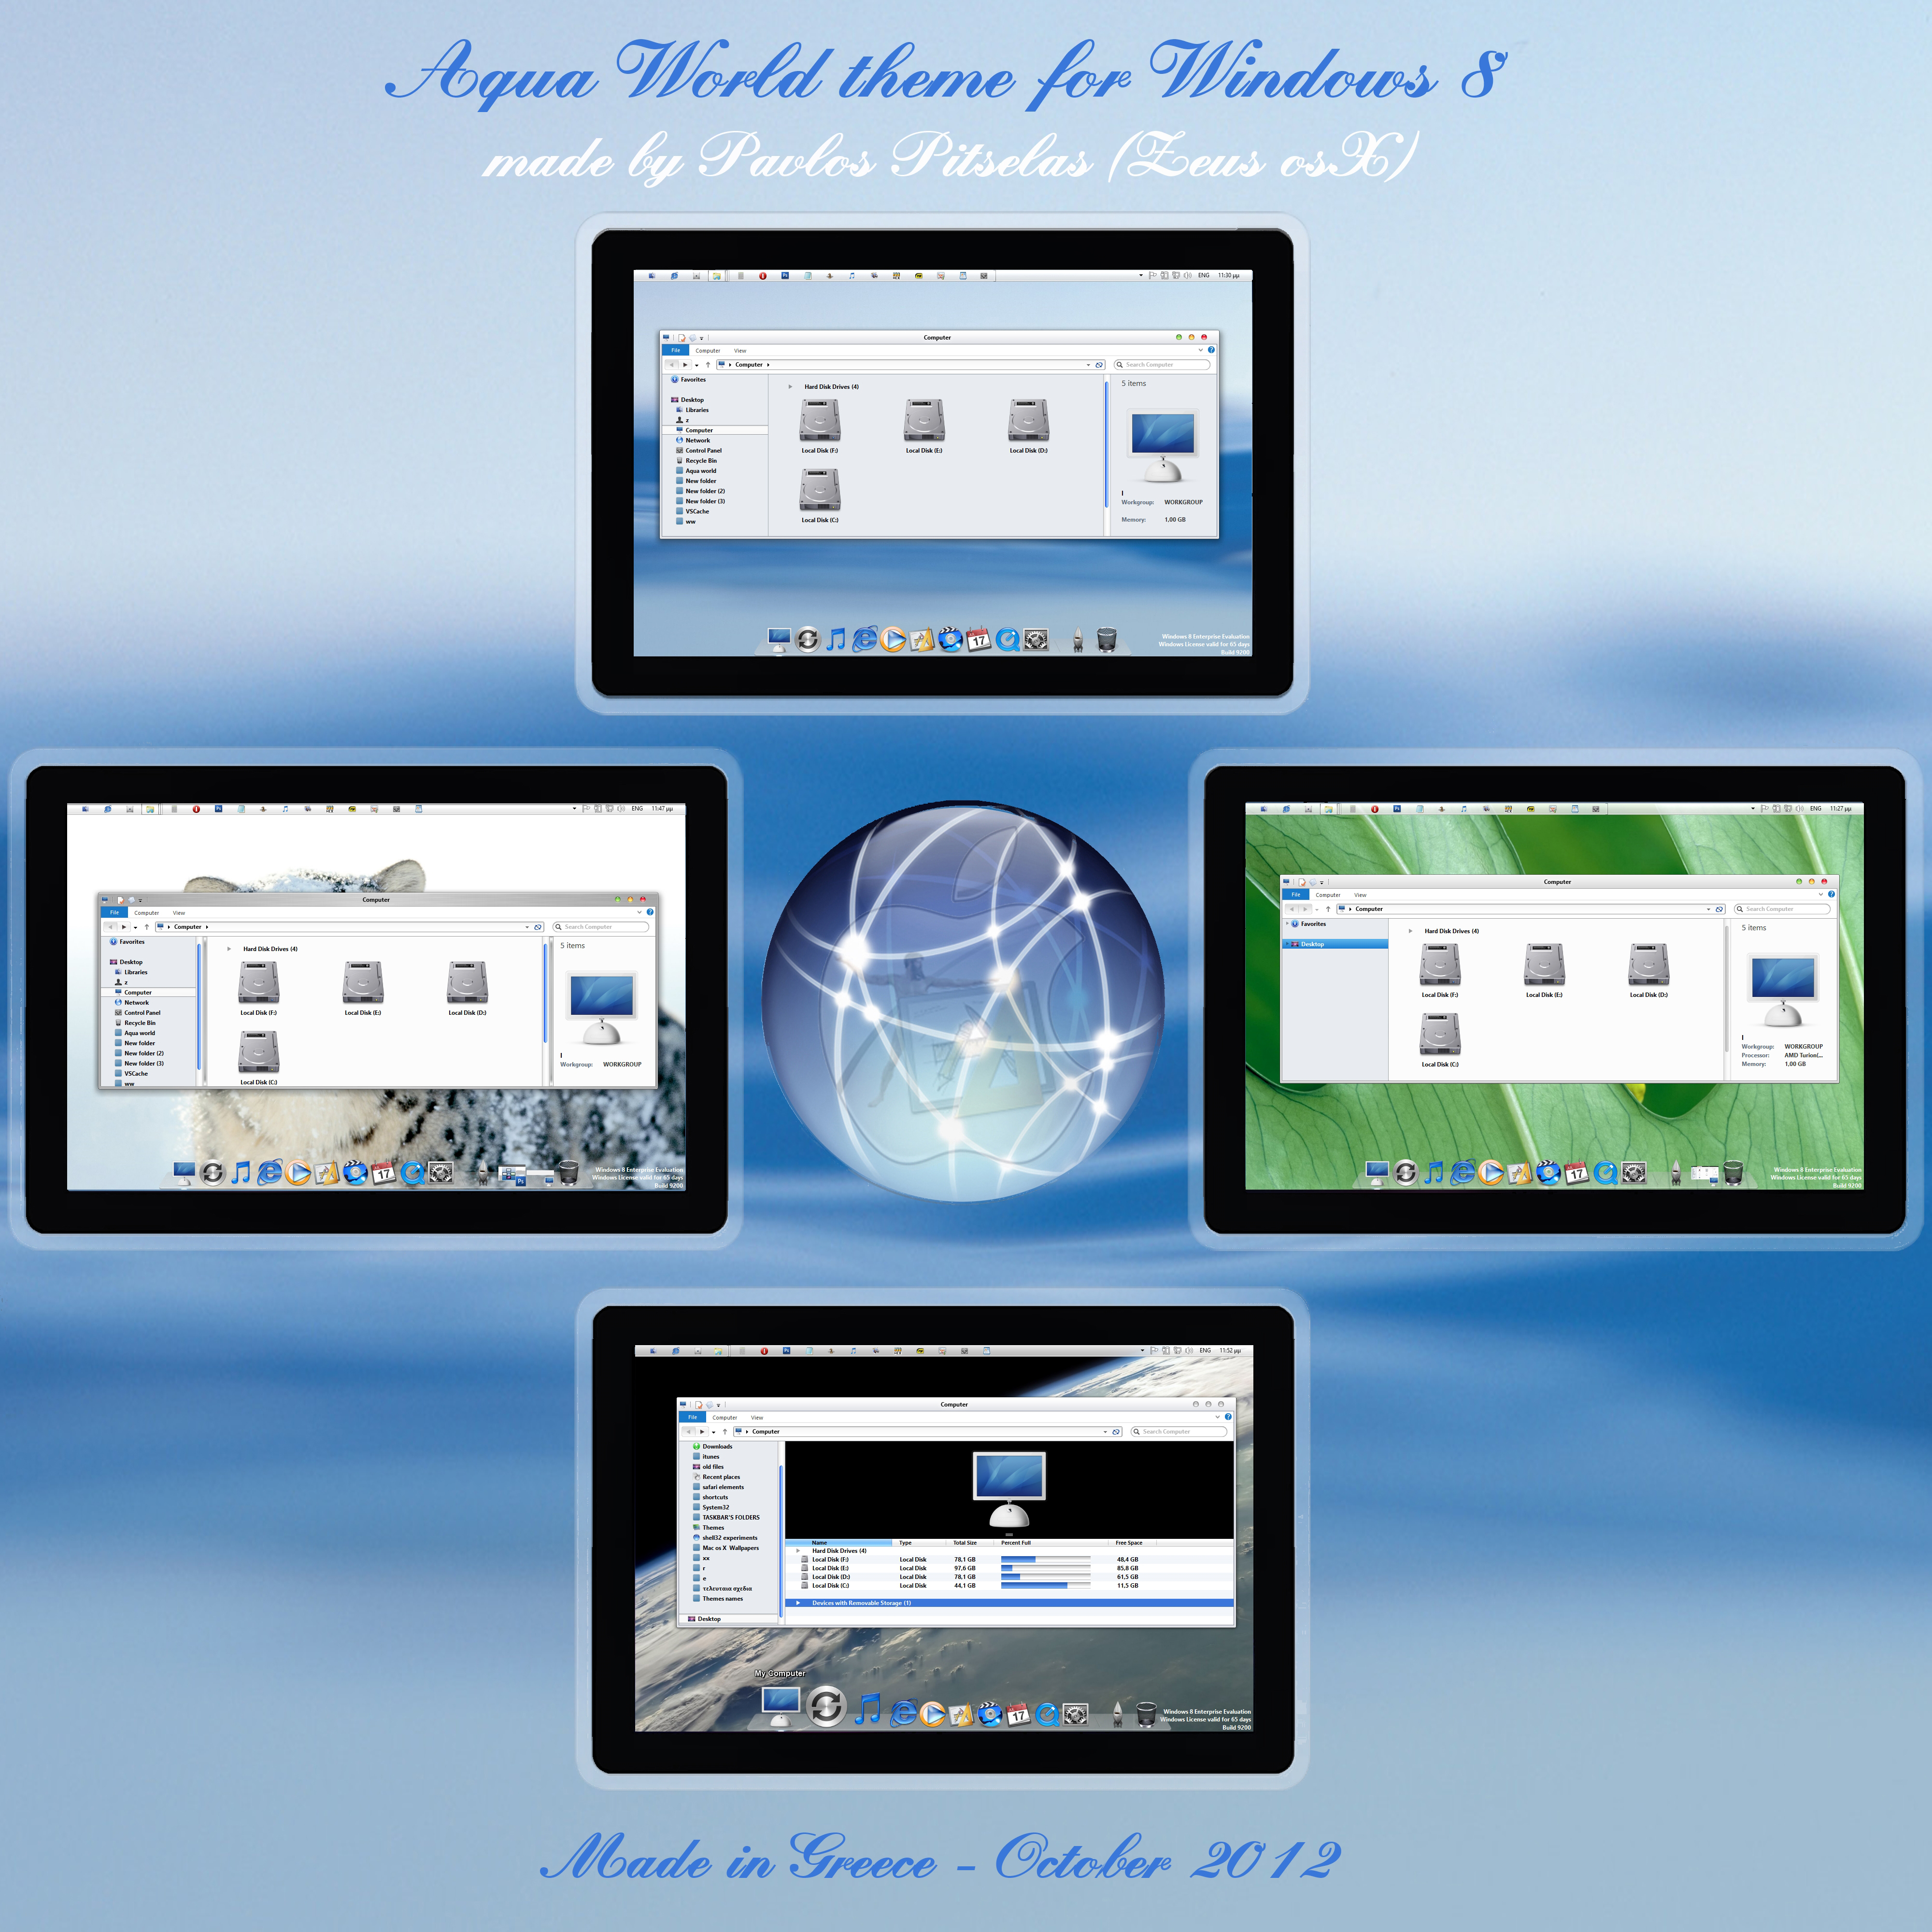 Aqua World os x style Theme for Windows 8 rtm